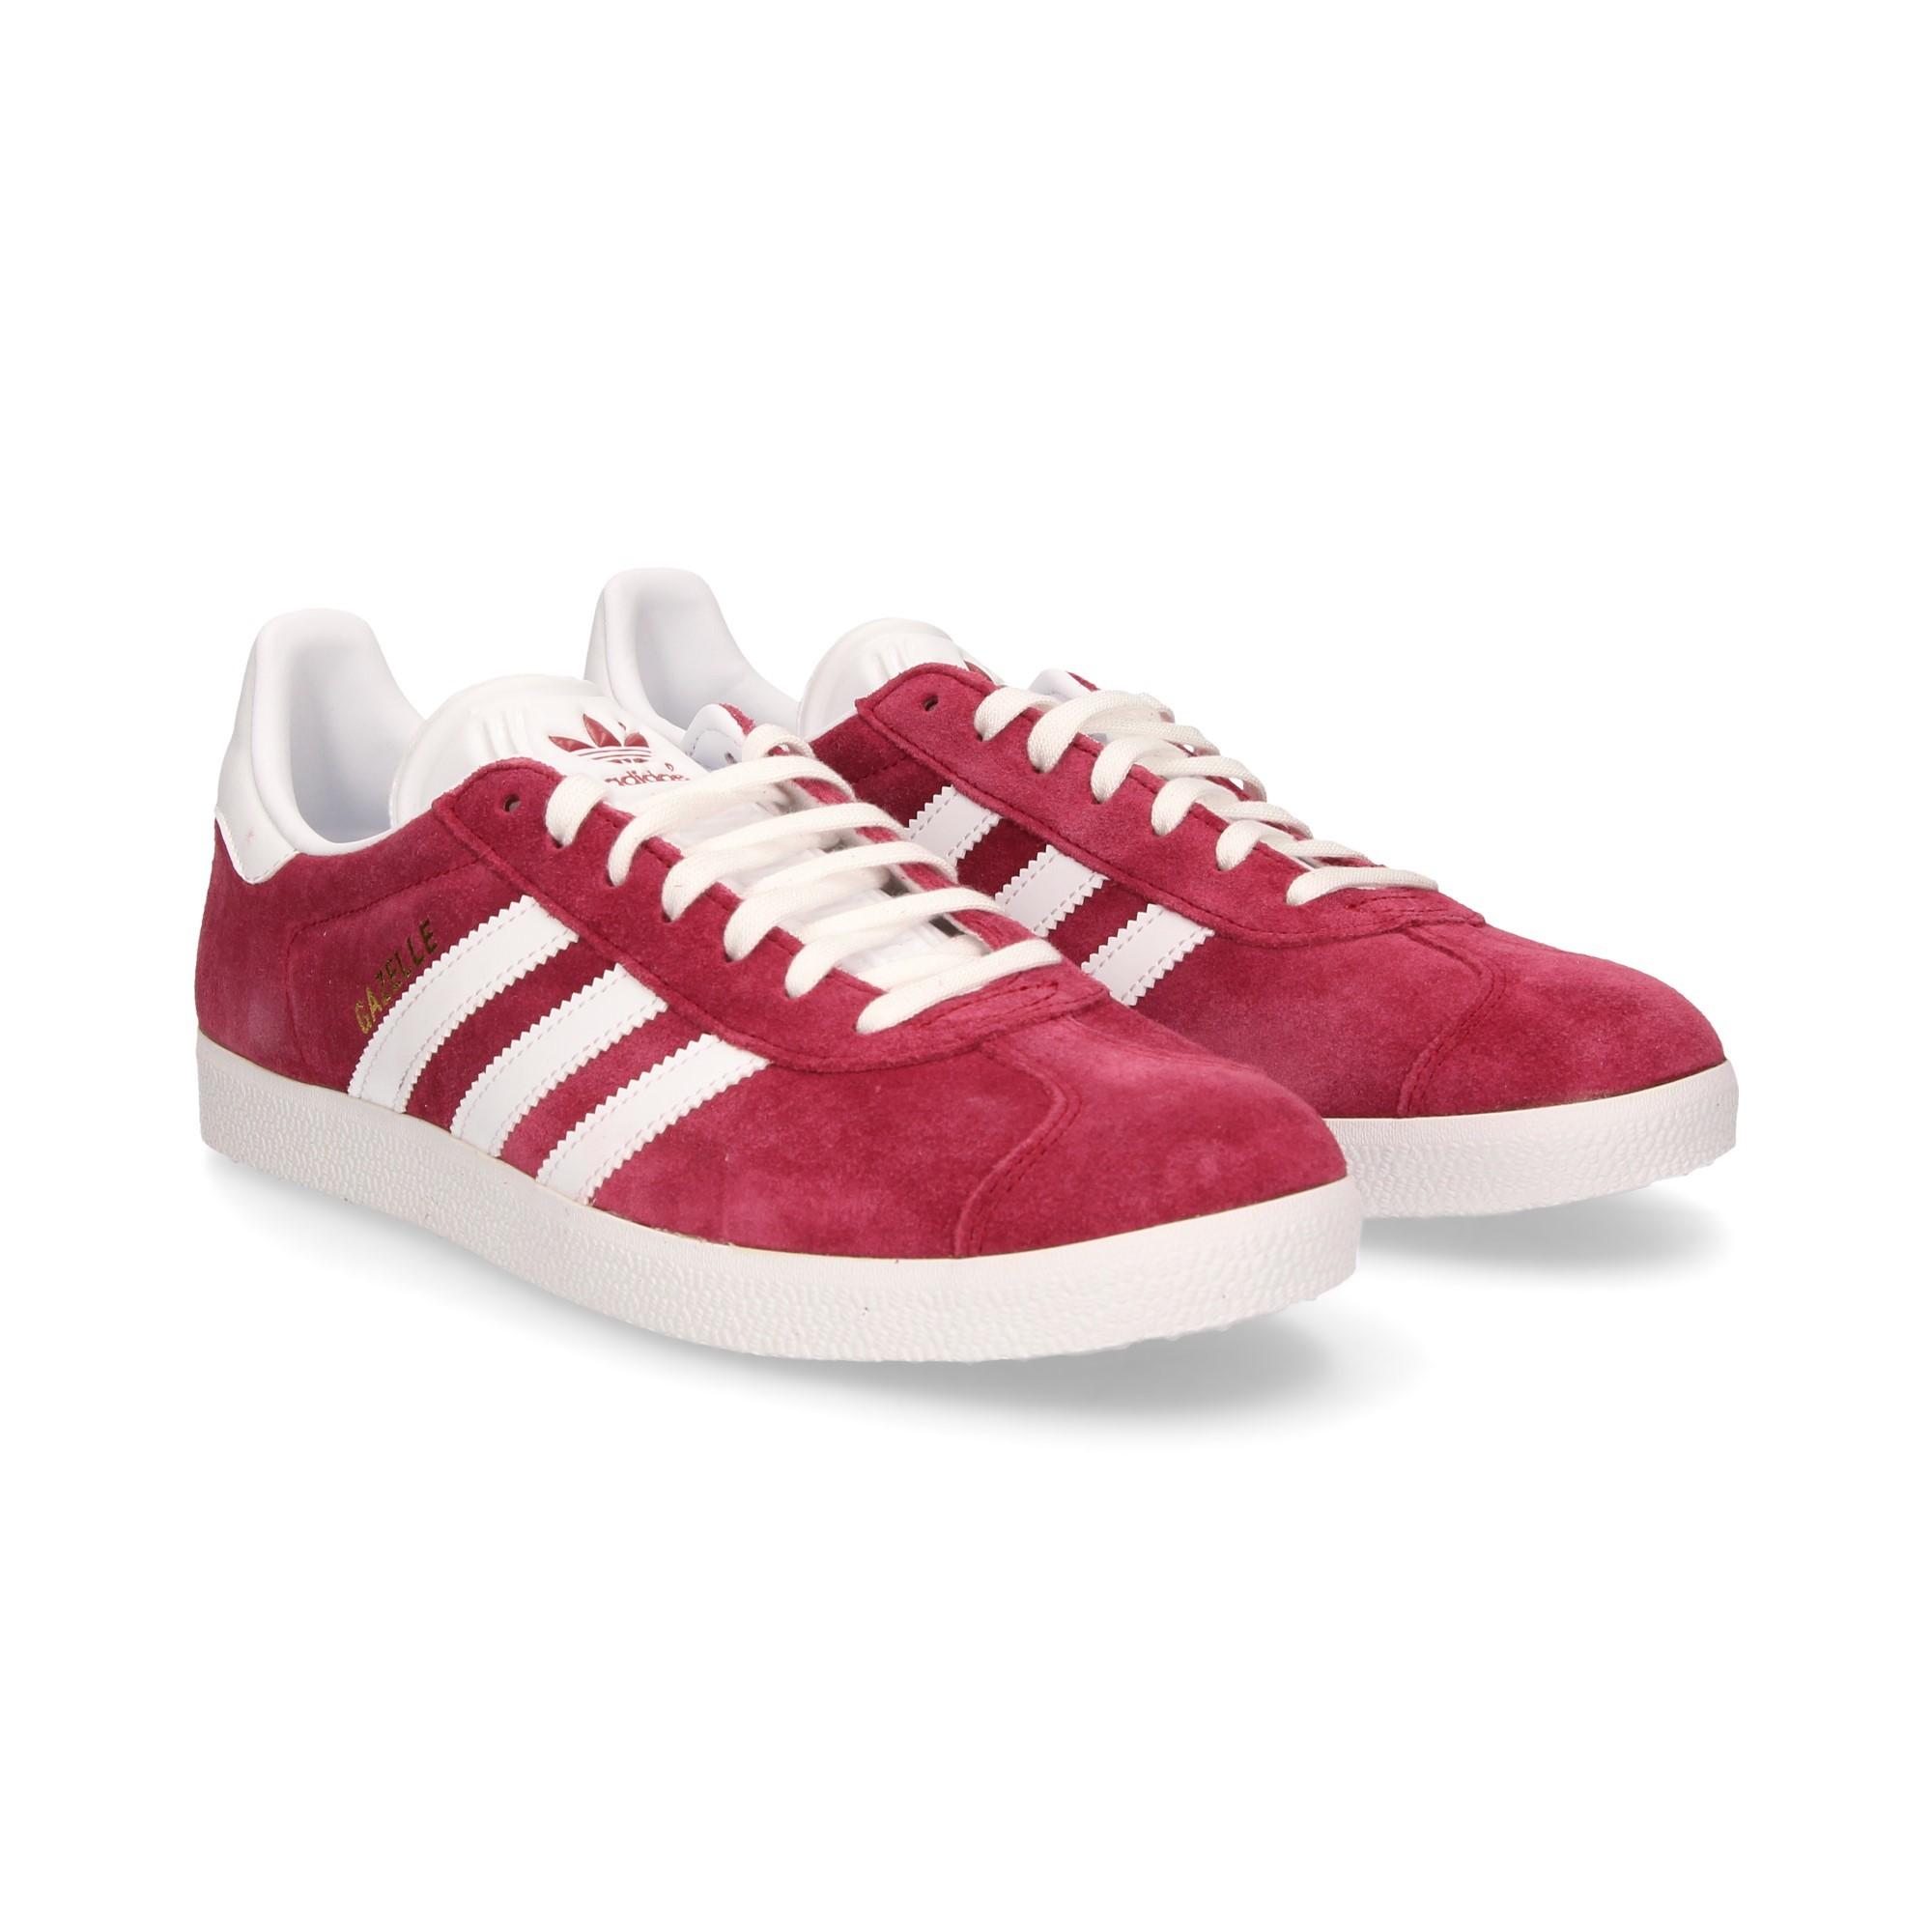 adidas scarpe bordeaux uomo